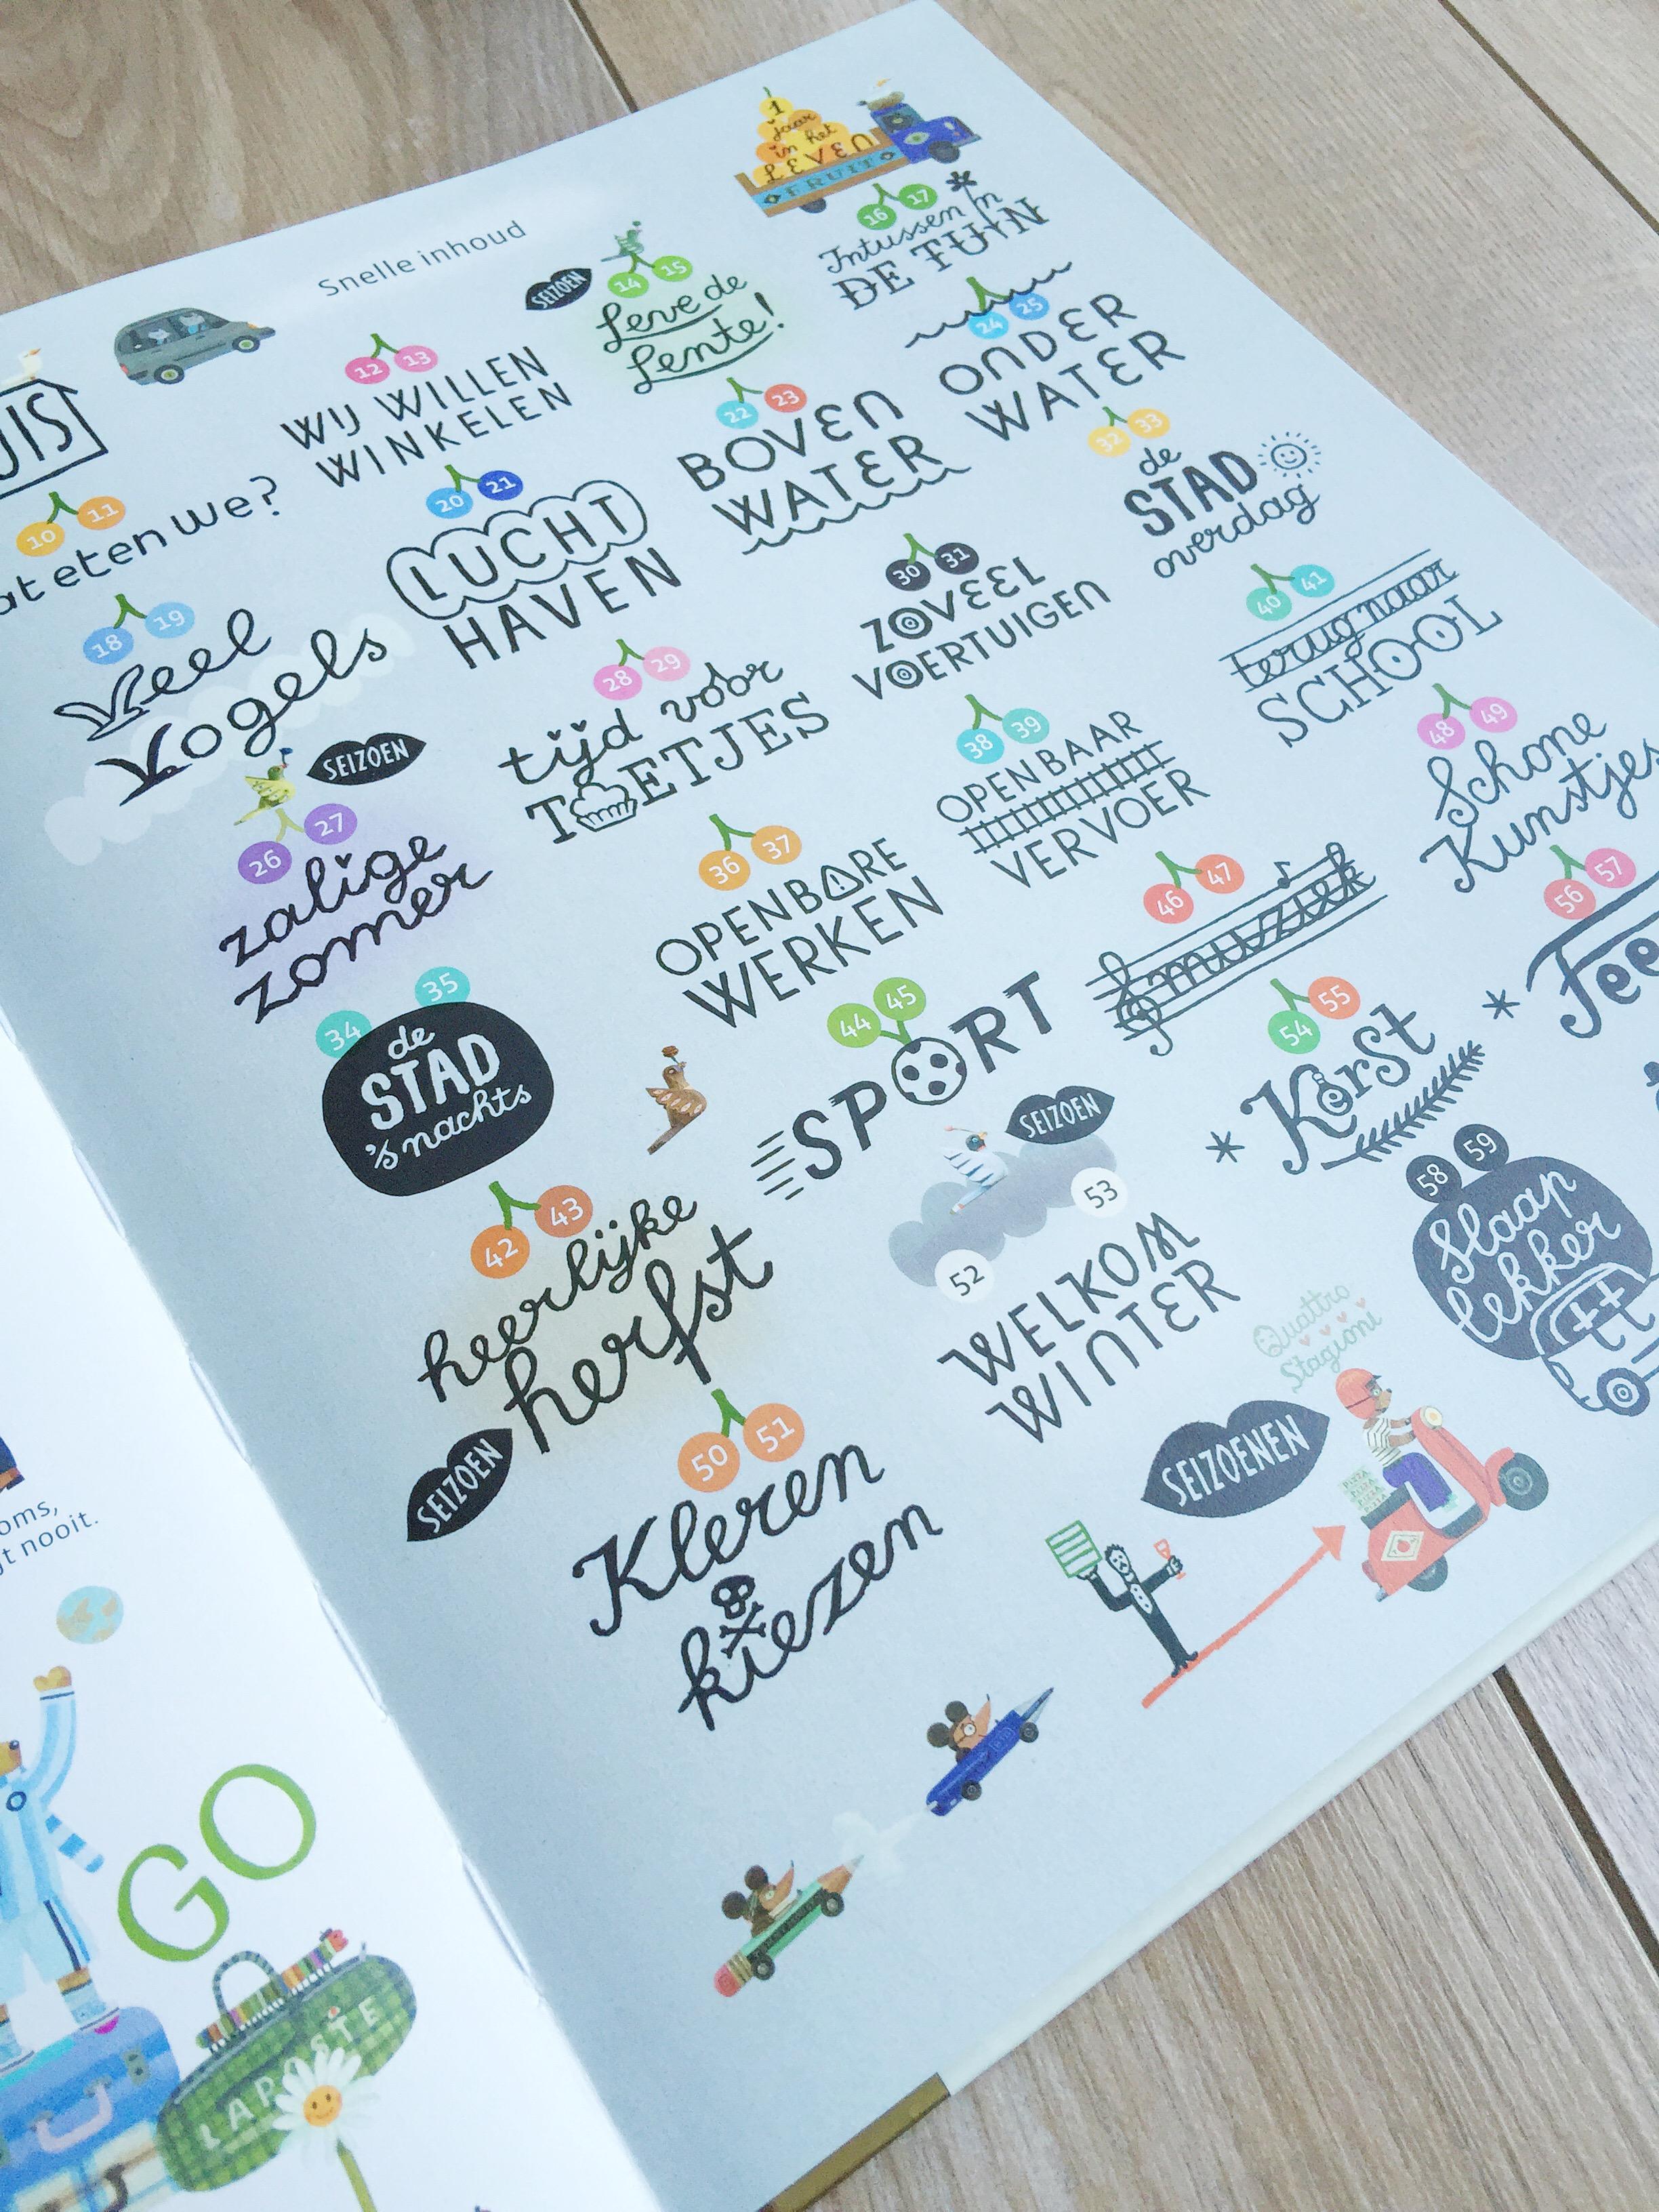 het grootste en leukse beeldenwoordenboek